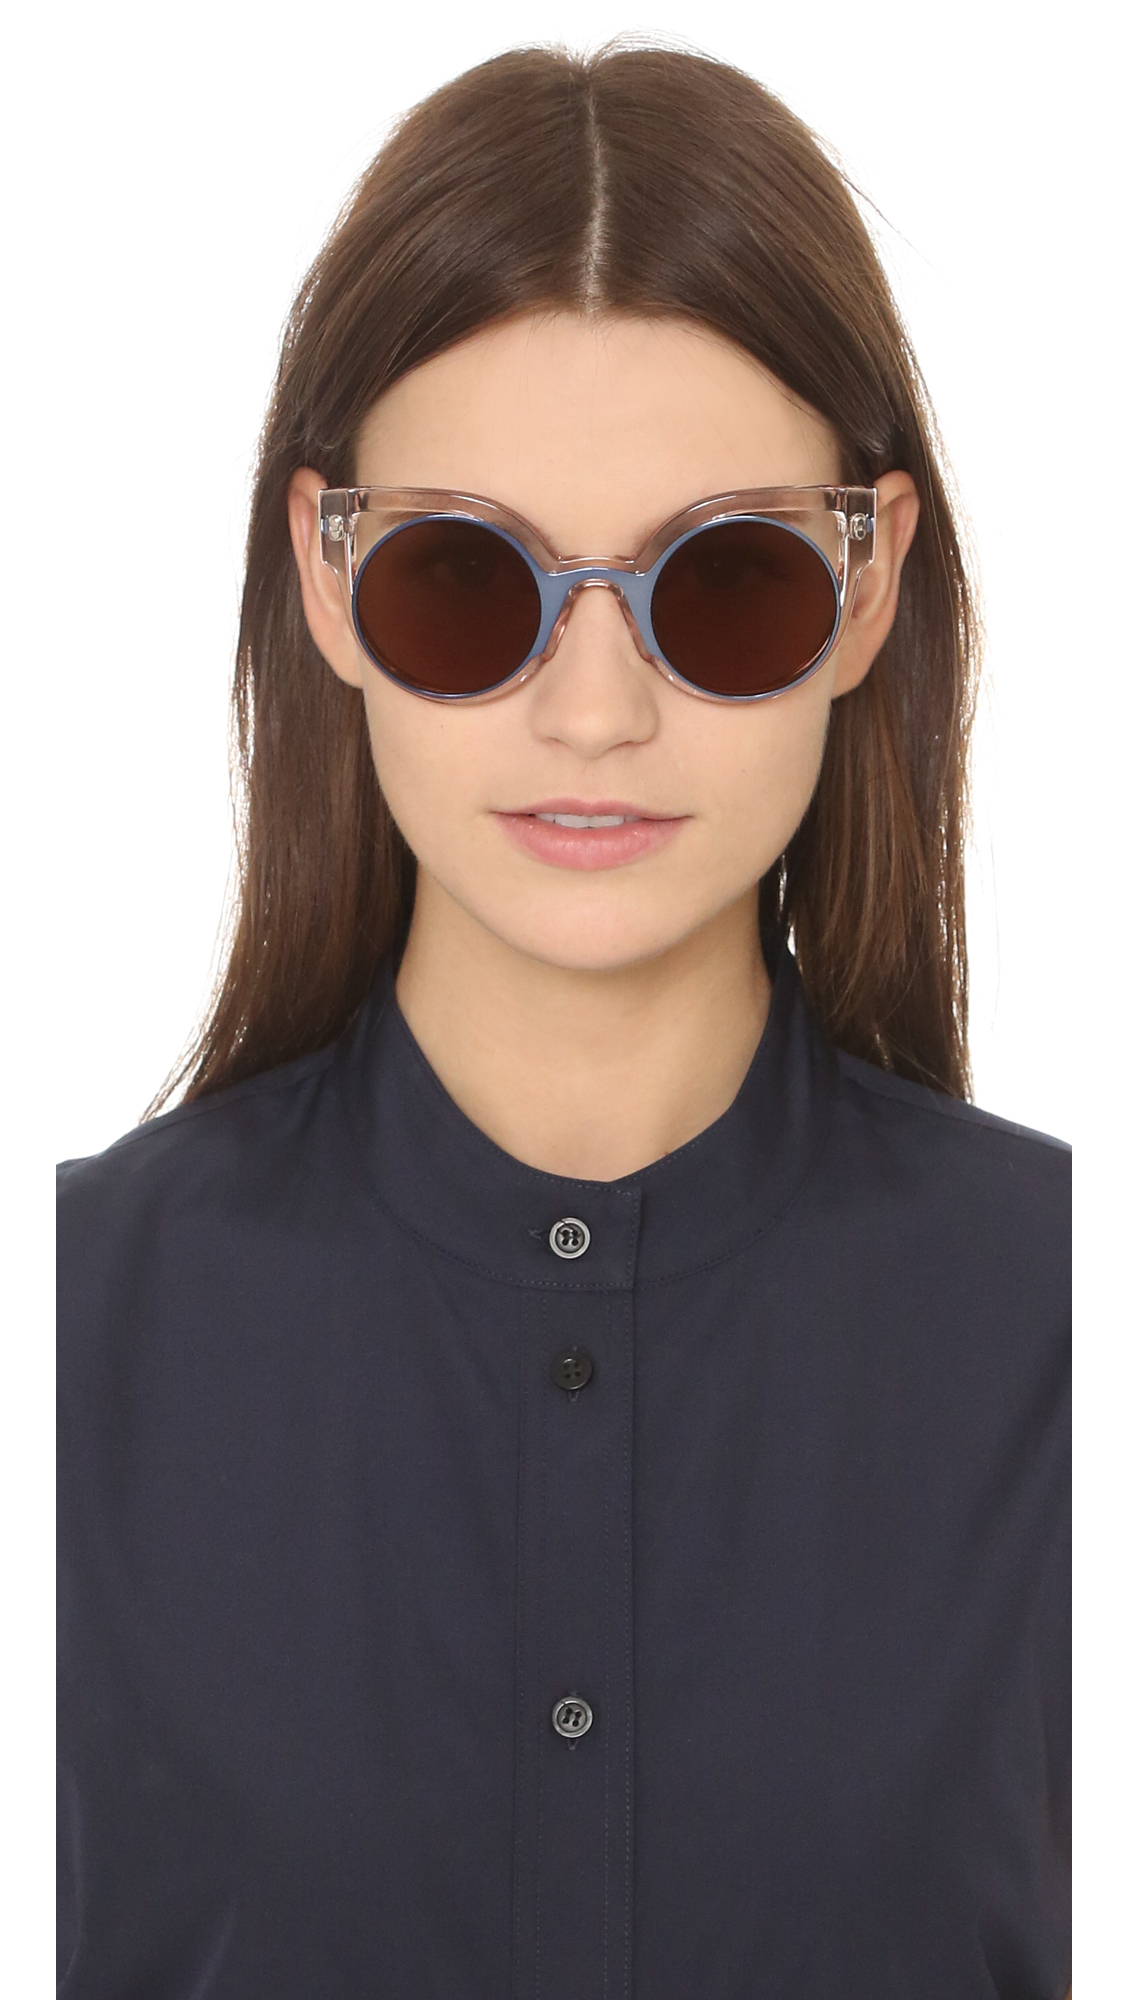 cb3a1f25aeef Fendi Round Cutout Sunglasses in Blue - Lyst